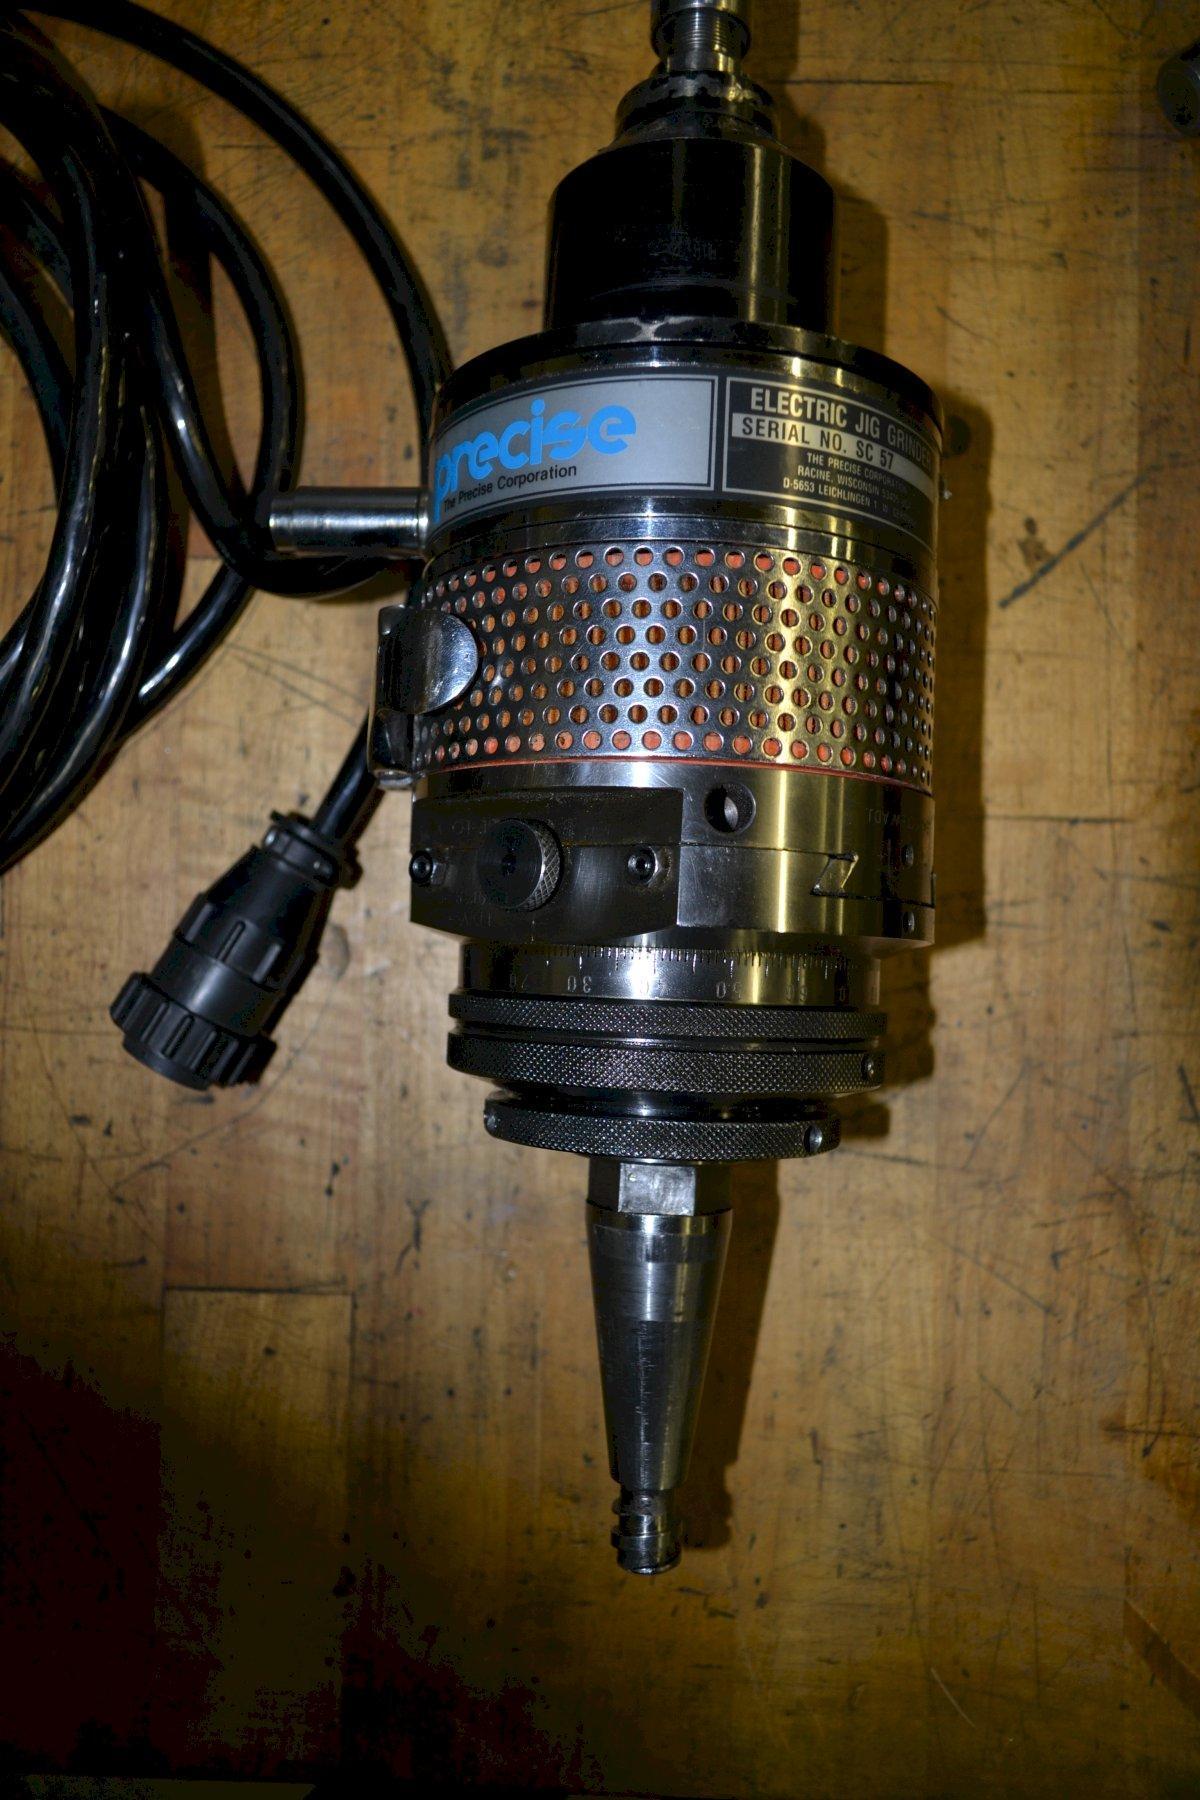 Precise Model SC-57 JIL Grinding Head